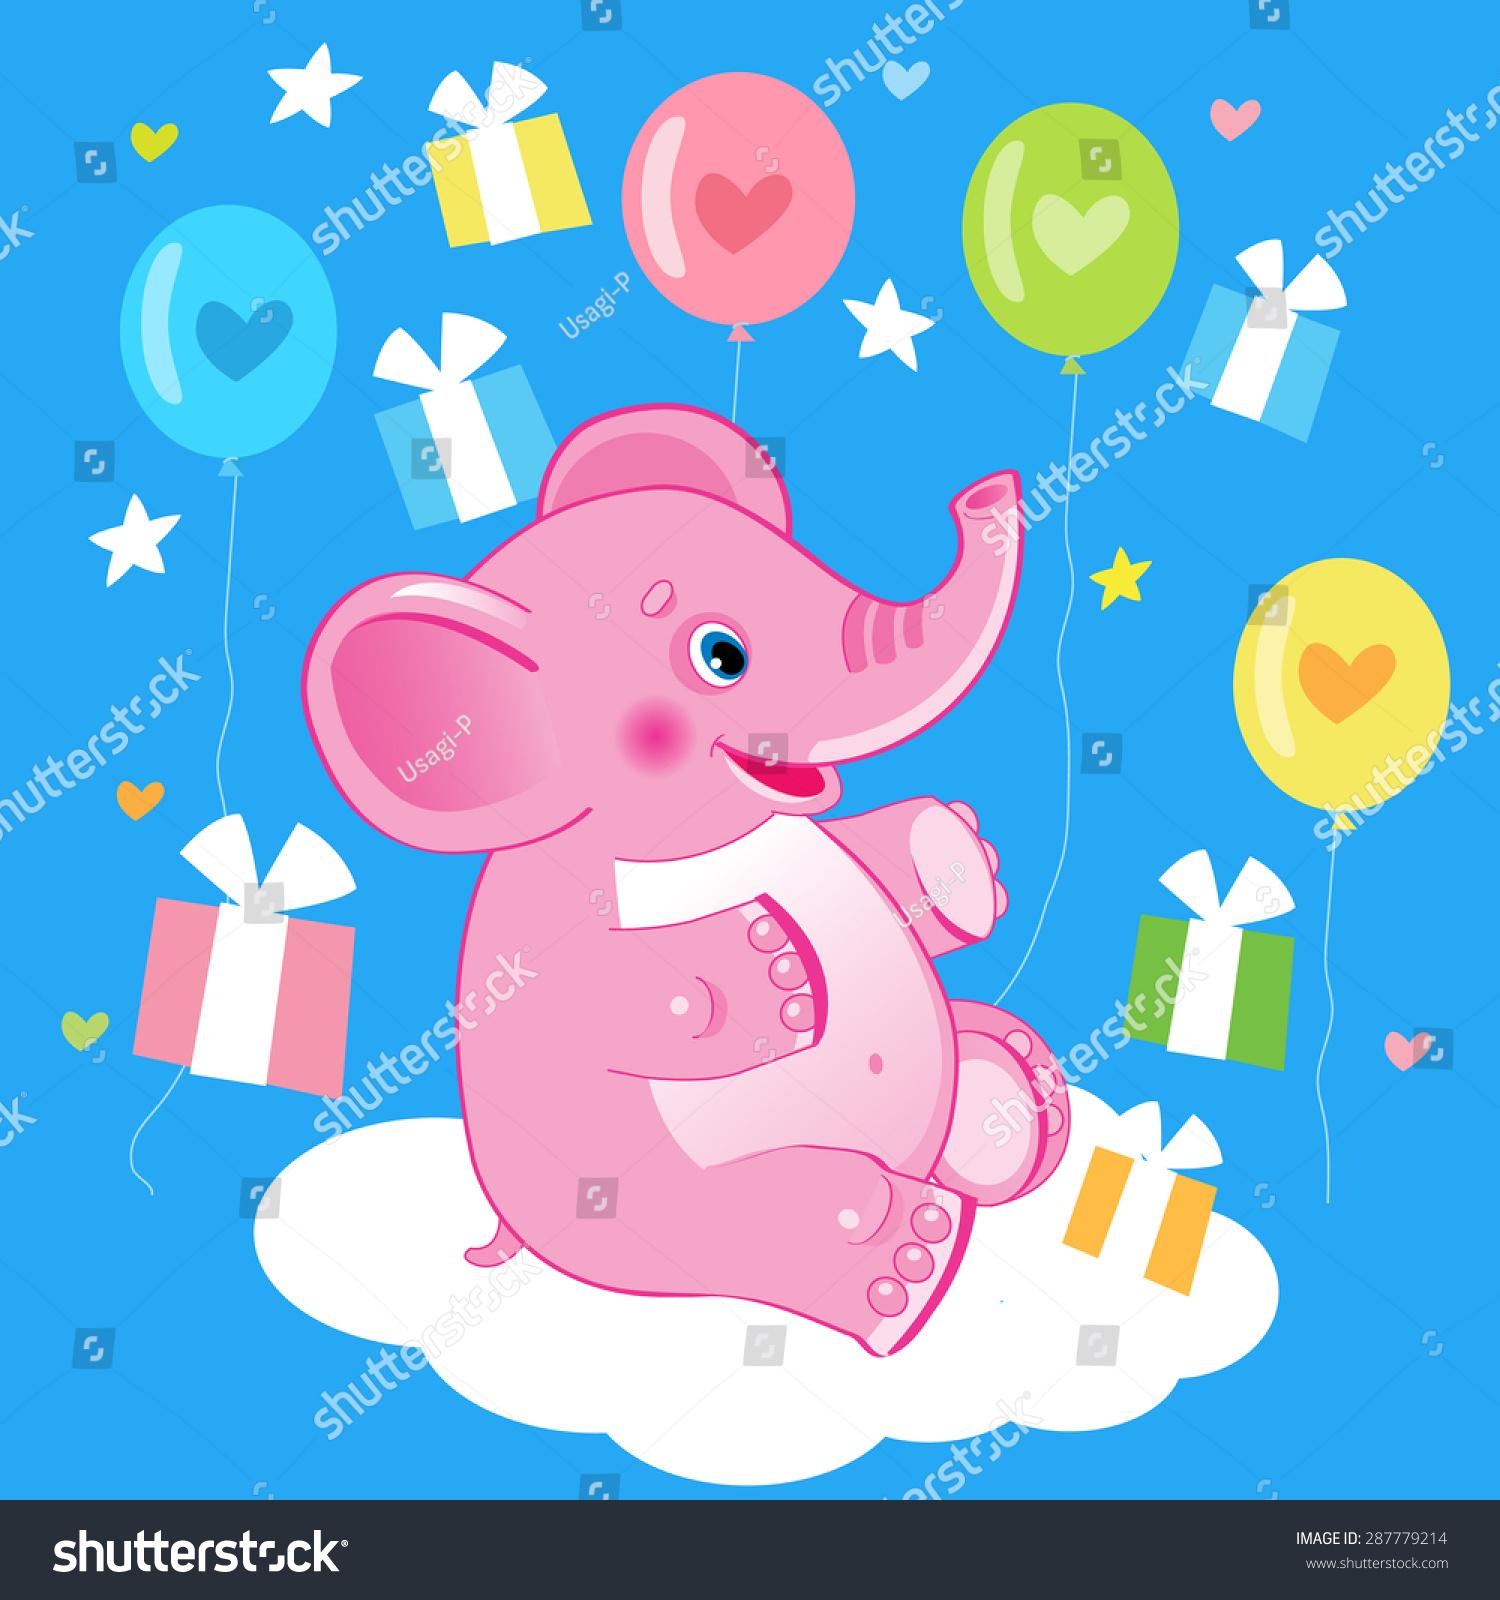 Good Wallpaper Cartoon Elephant - stock-vector-happy-birthday-birthday-picture-cute-elephant-vector-illustration-cute-elephant-drawing-287779214  Gallery_801392  .jpg